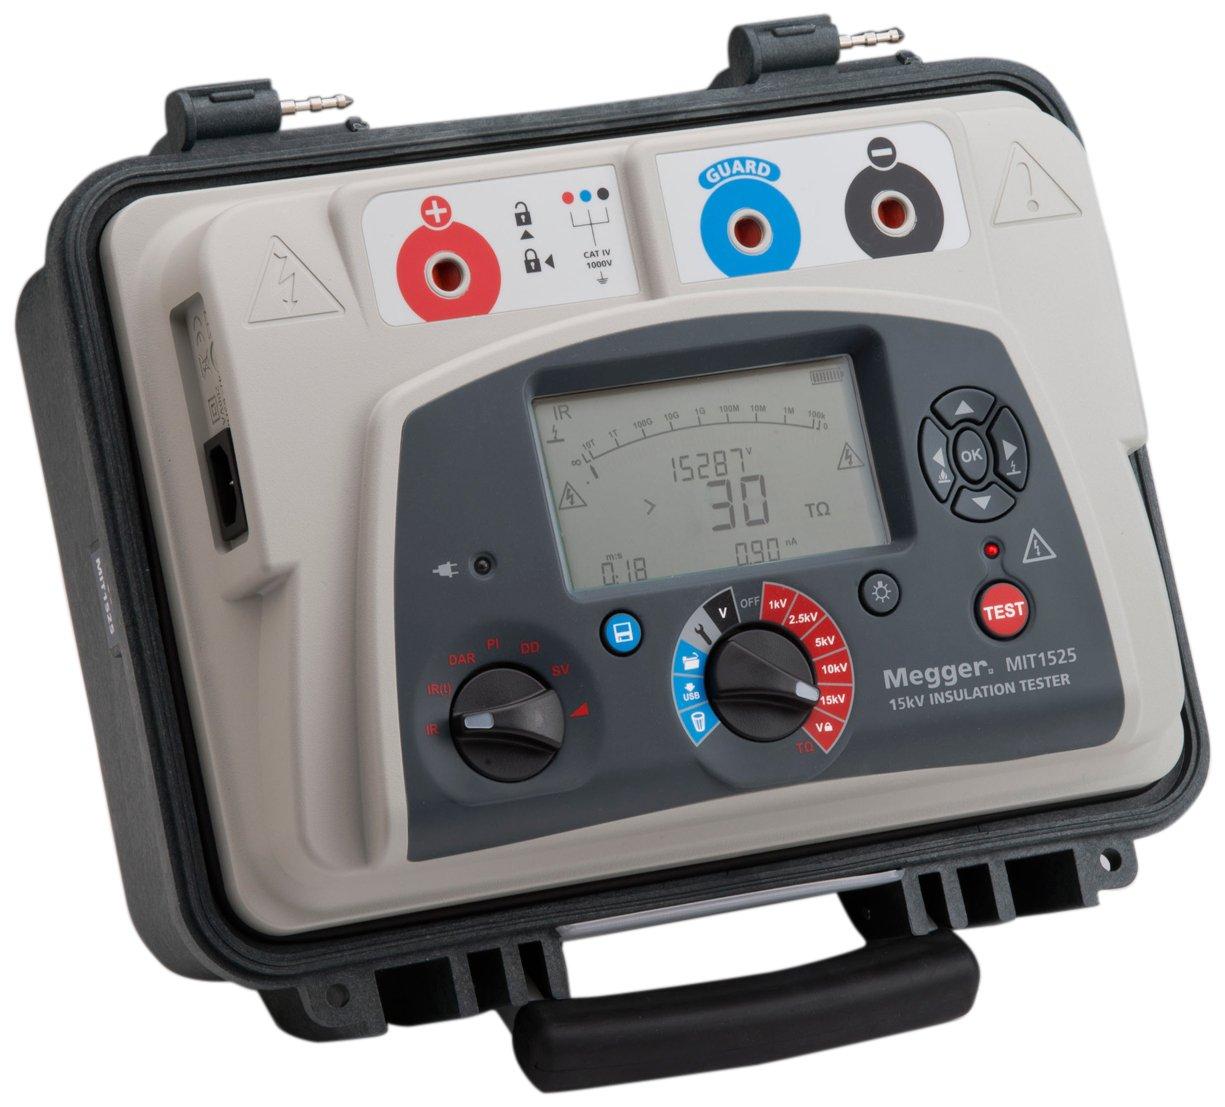 Megger MIT1525-US Megger Insulation Tester 15 kV LCD with Backlight Display